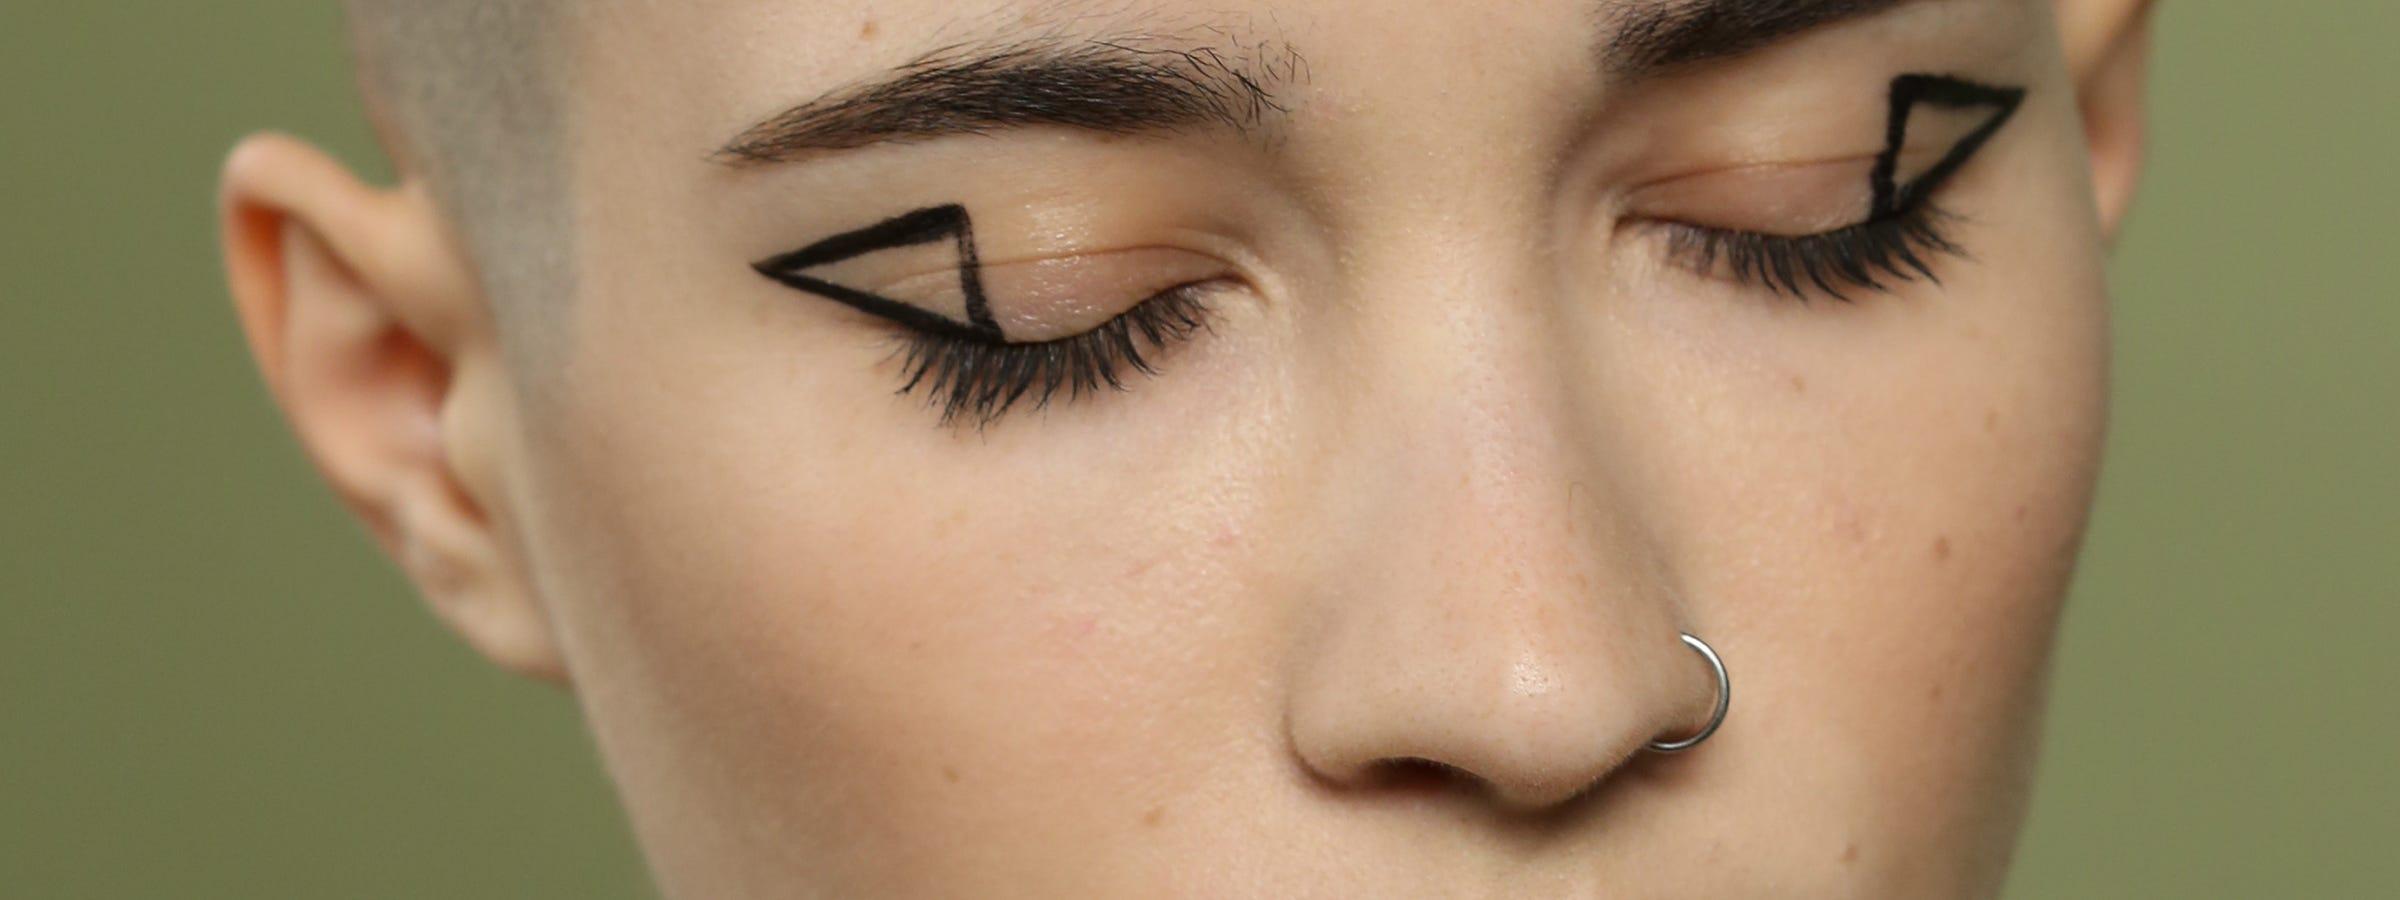 Subtle eye makeup